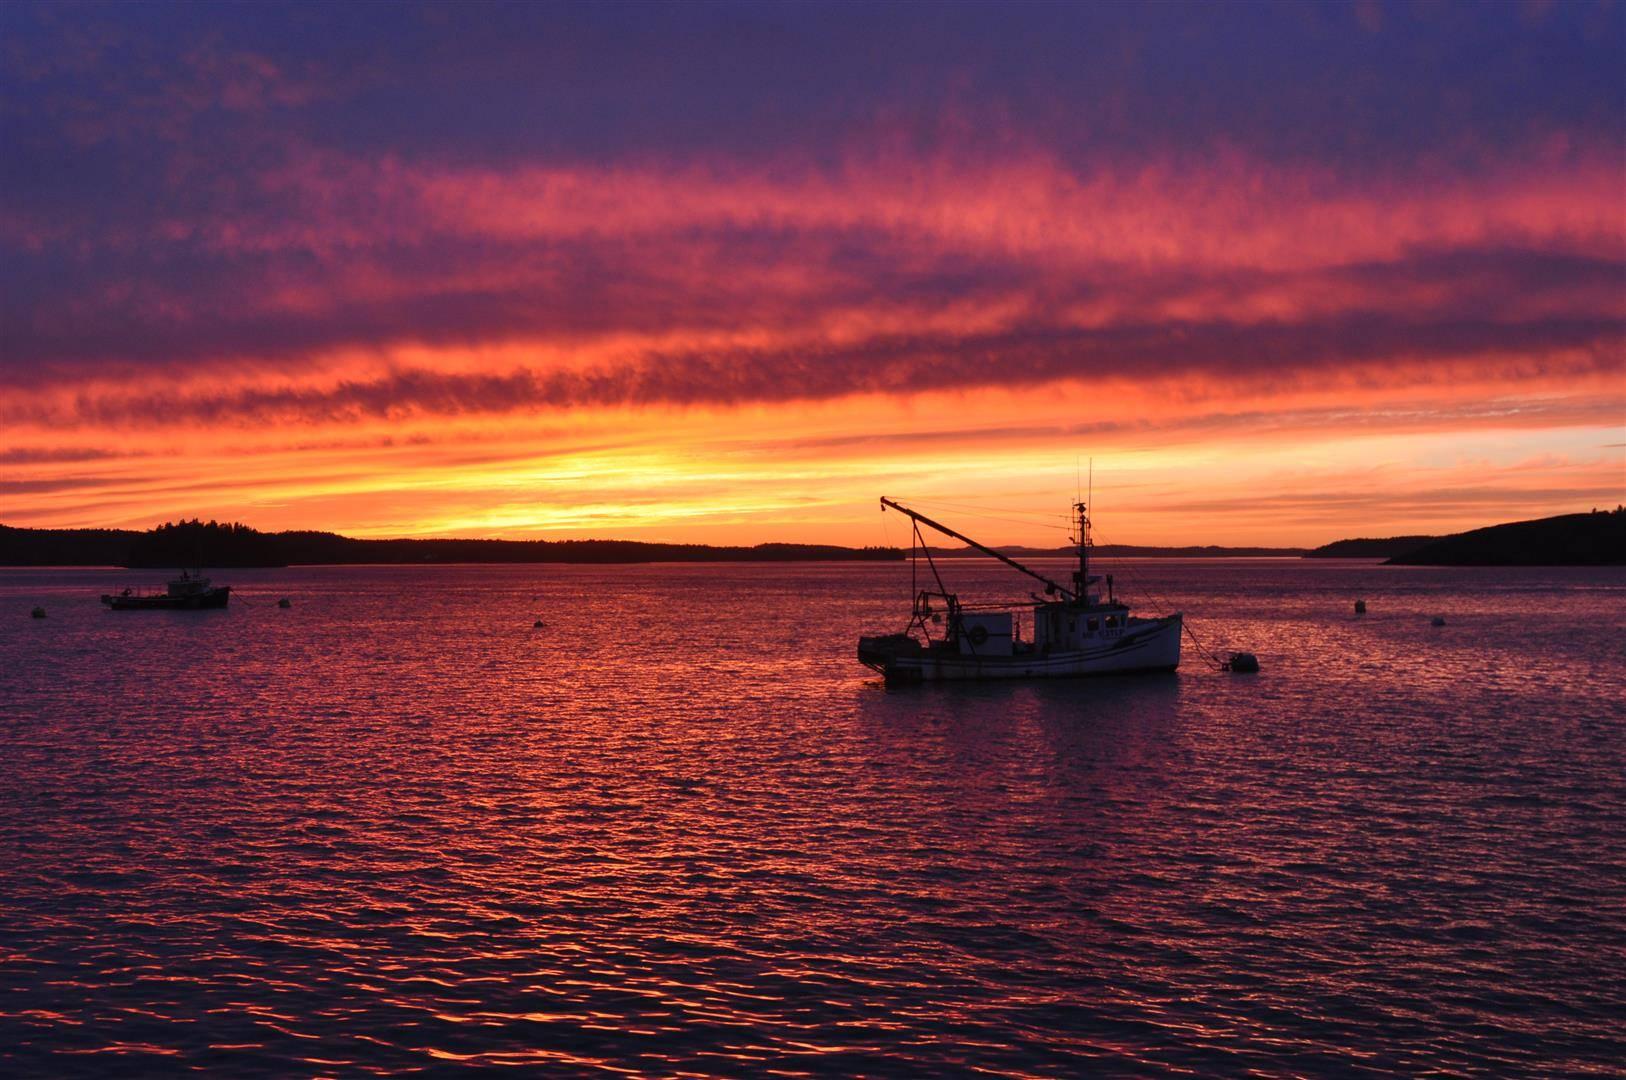 Sunset, Lubec, ME 5